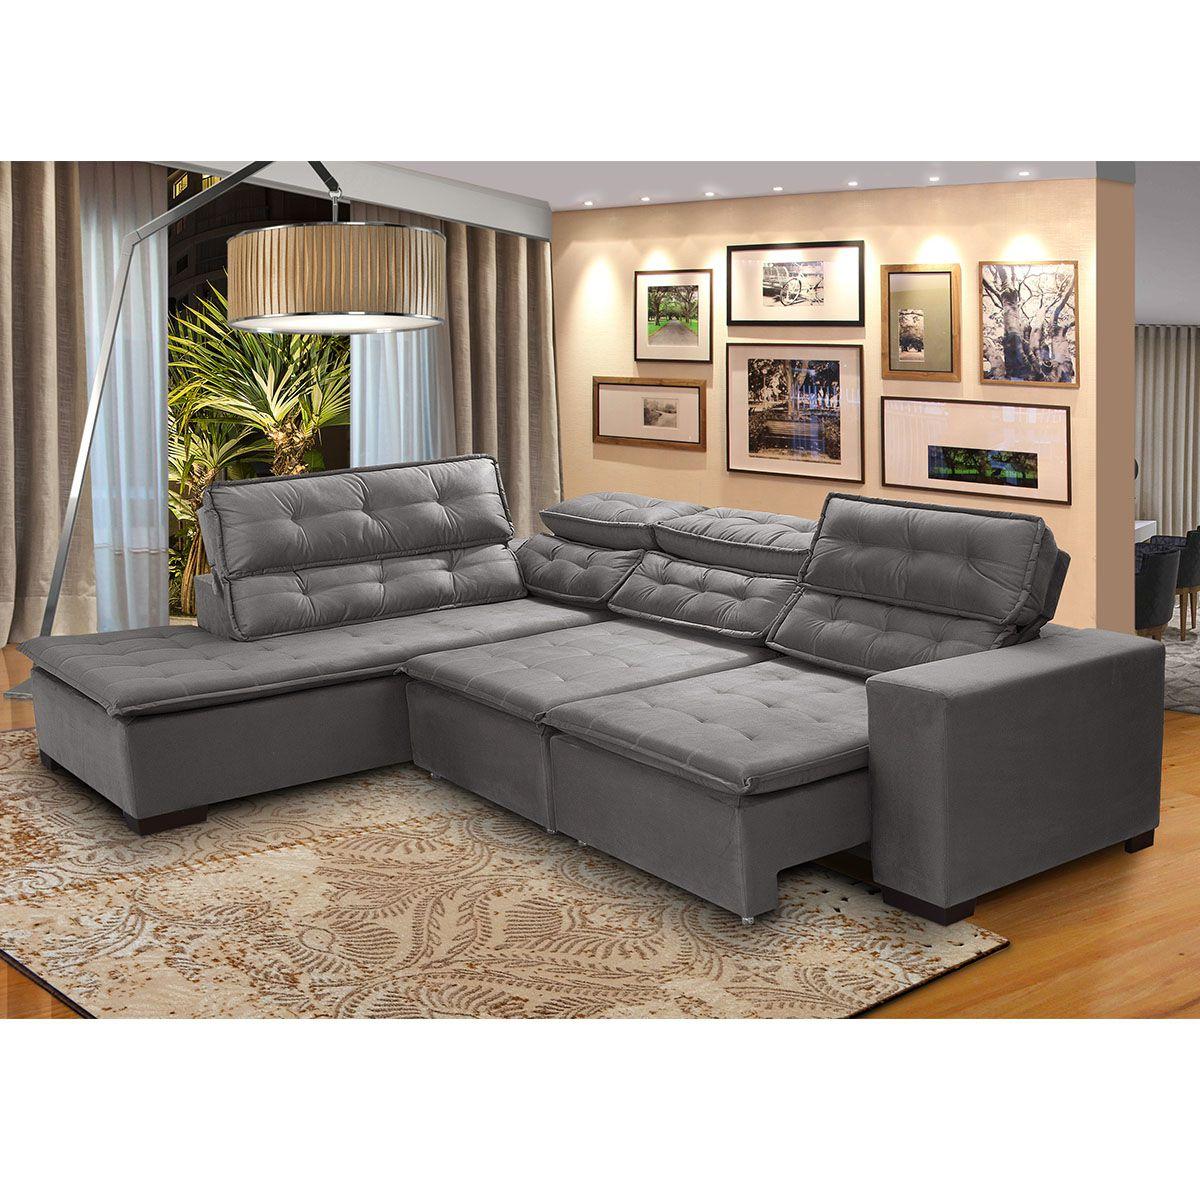 Remarkable Sofa Retratil De Canto Evergreenethics Interior Chair Design Evergreenethicsorg